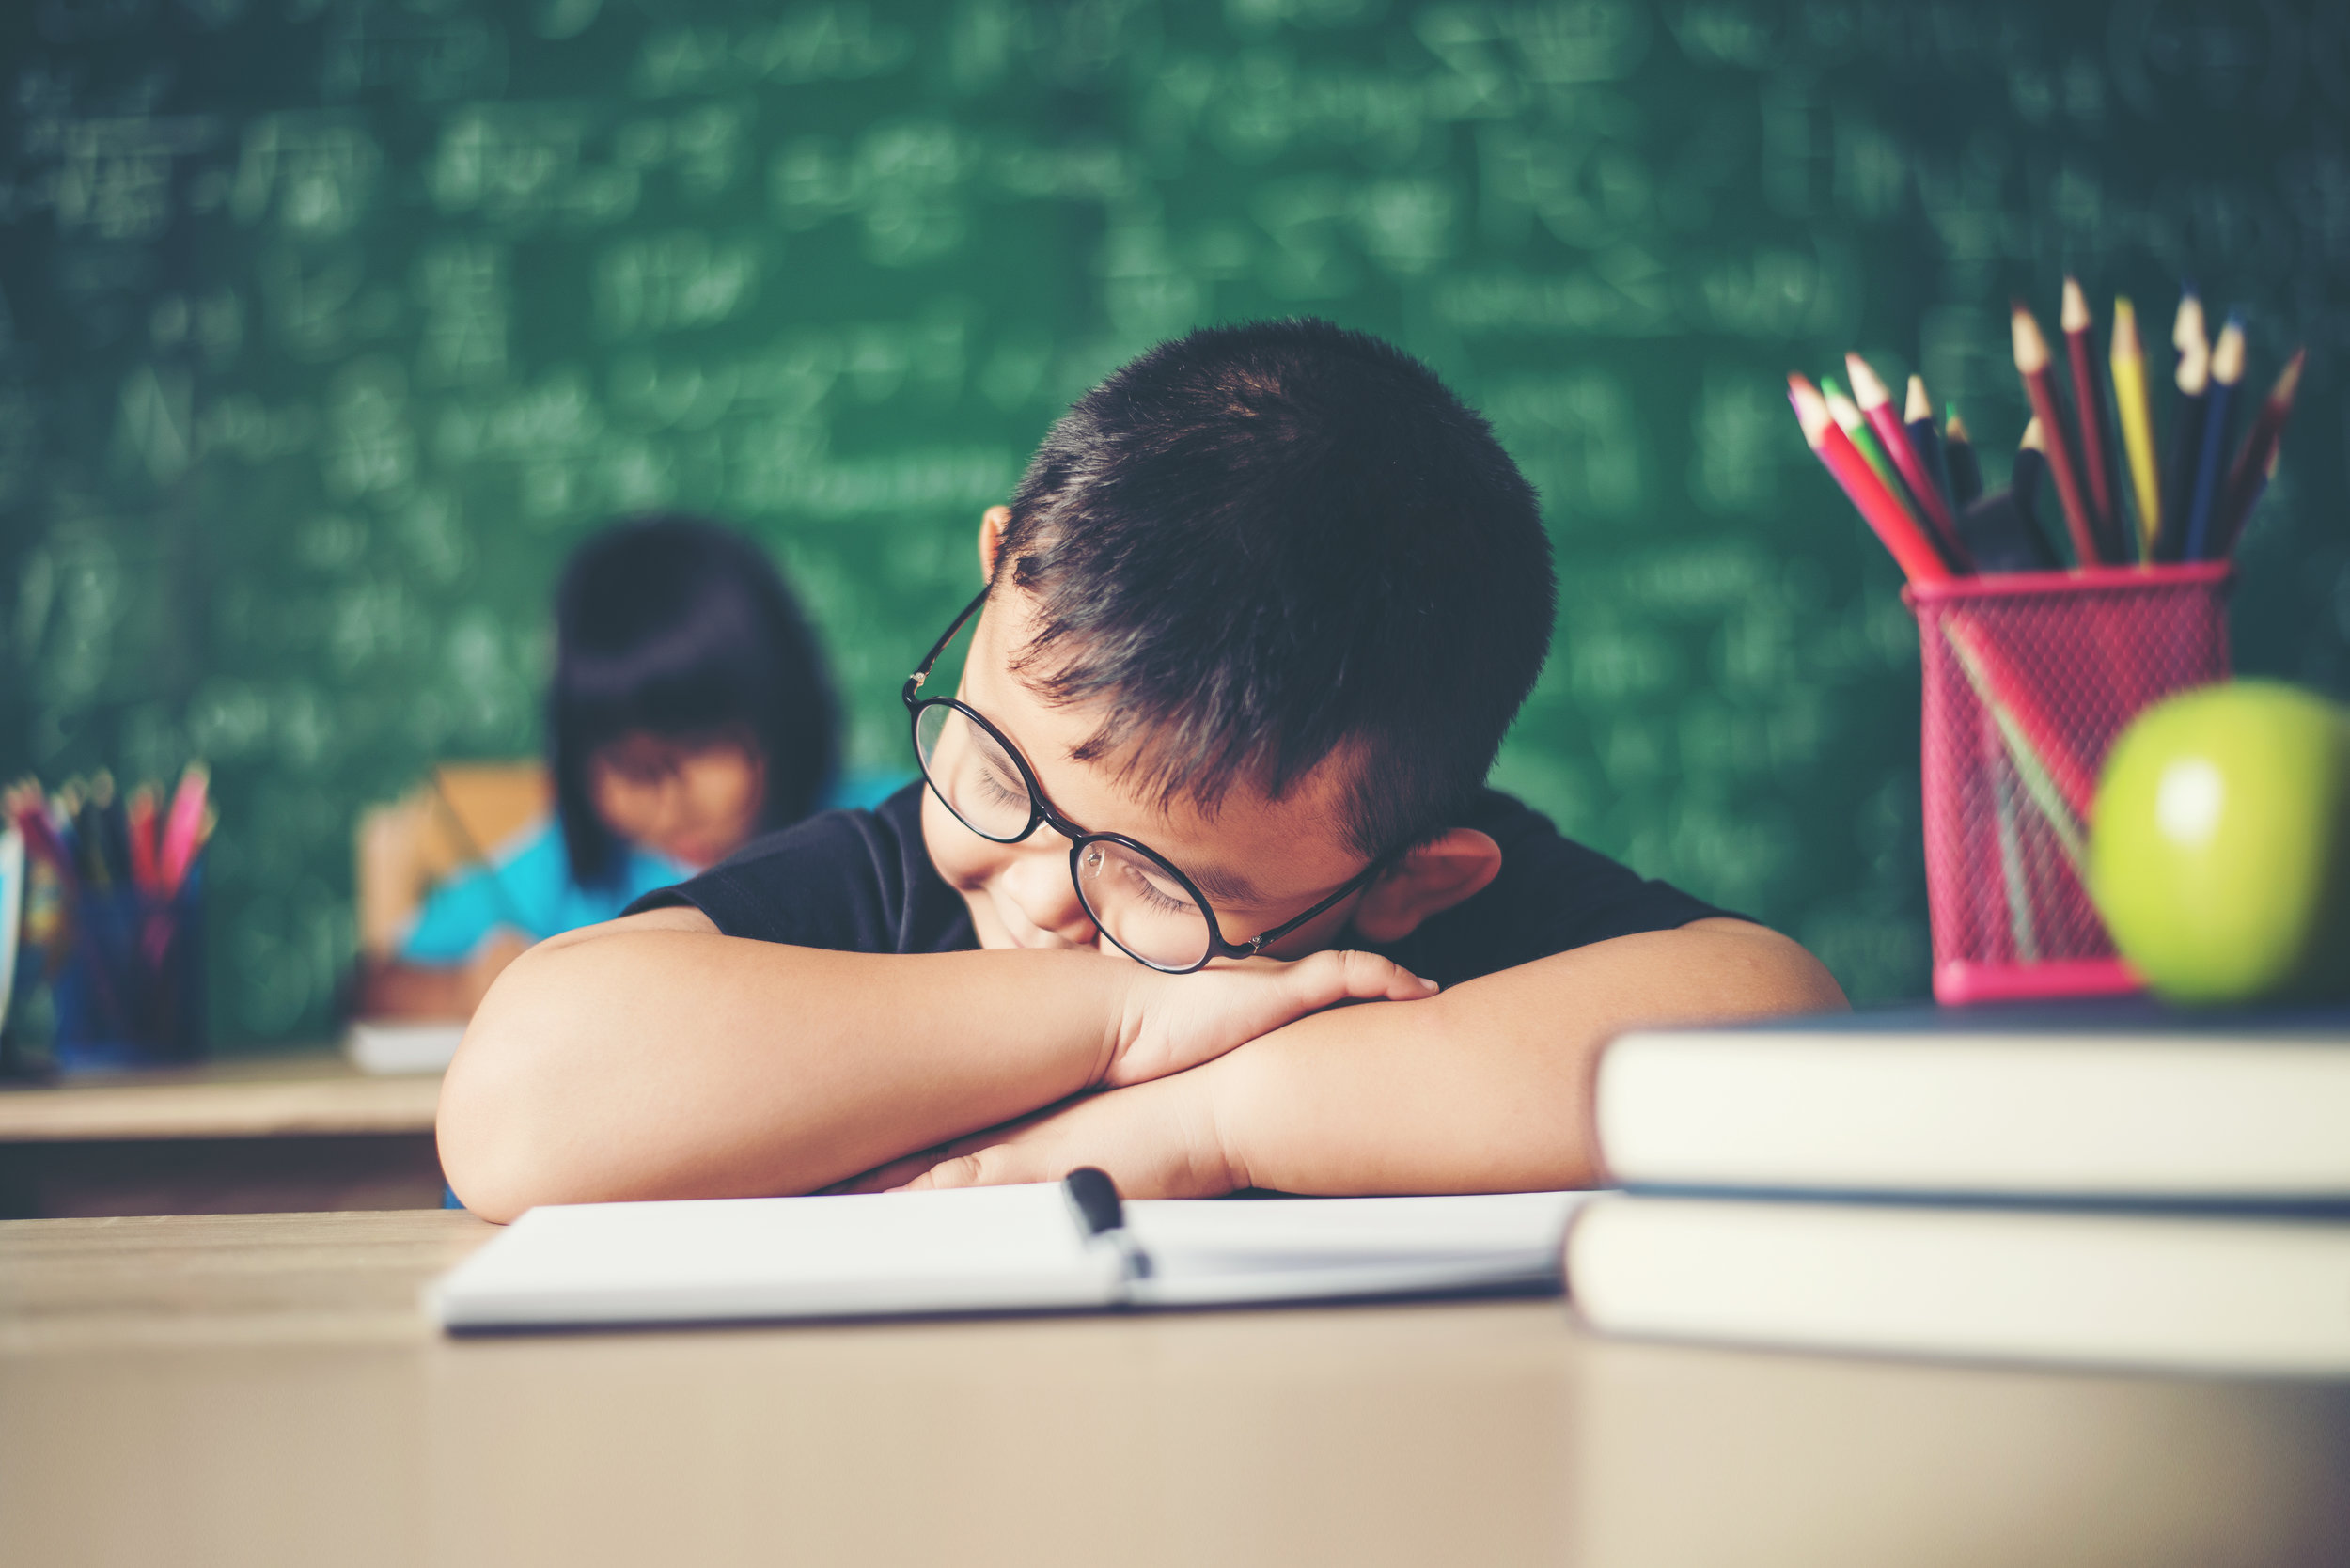 Boy_sleeping_on_the_books_in_the_classroom..jpeg